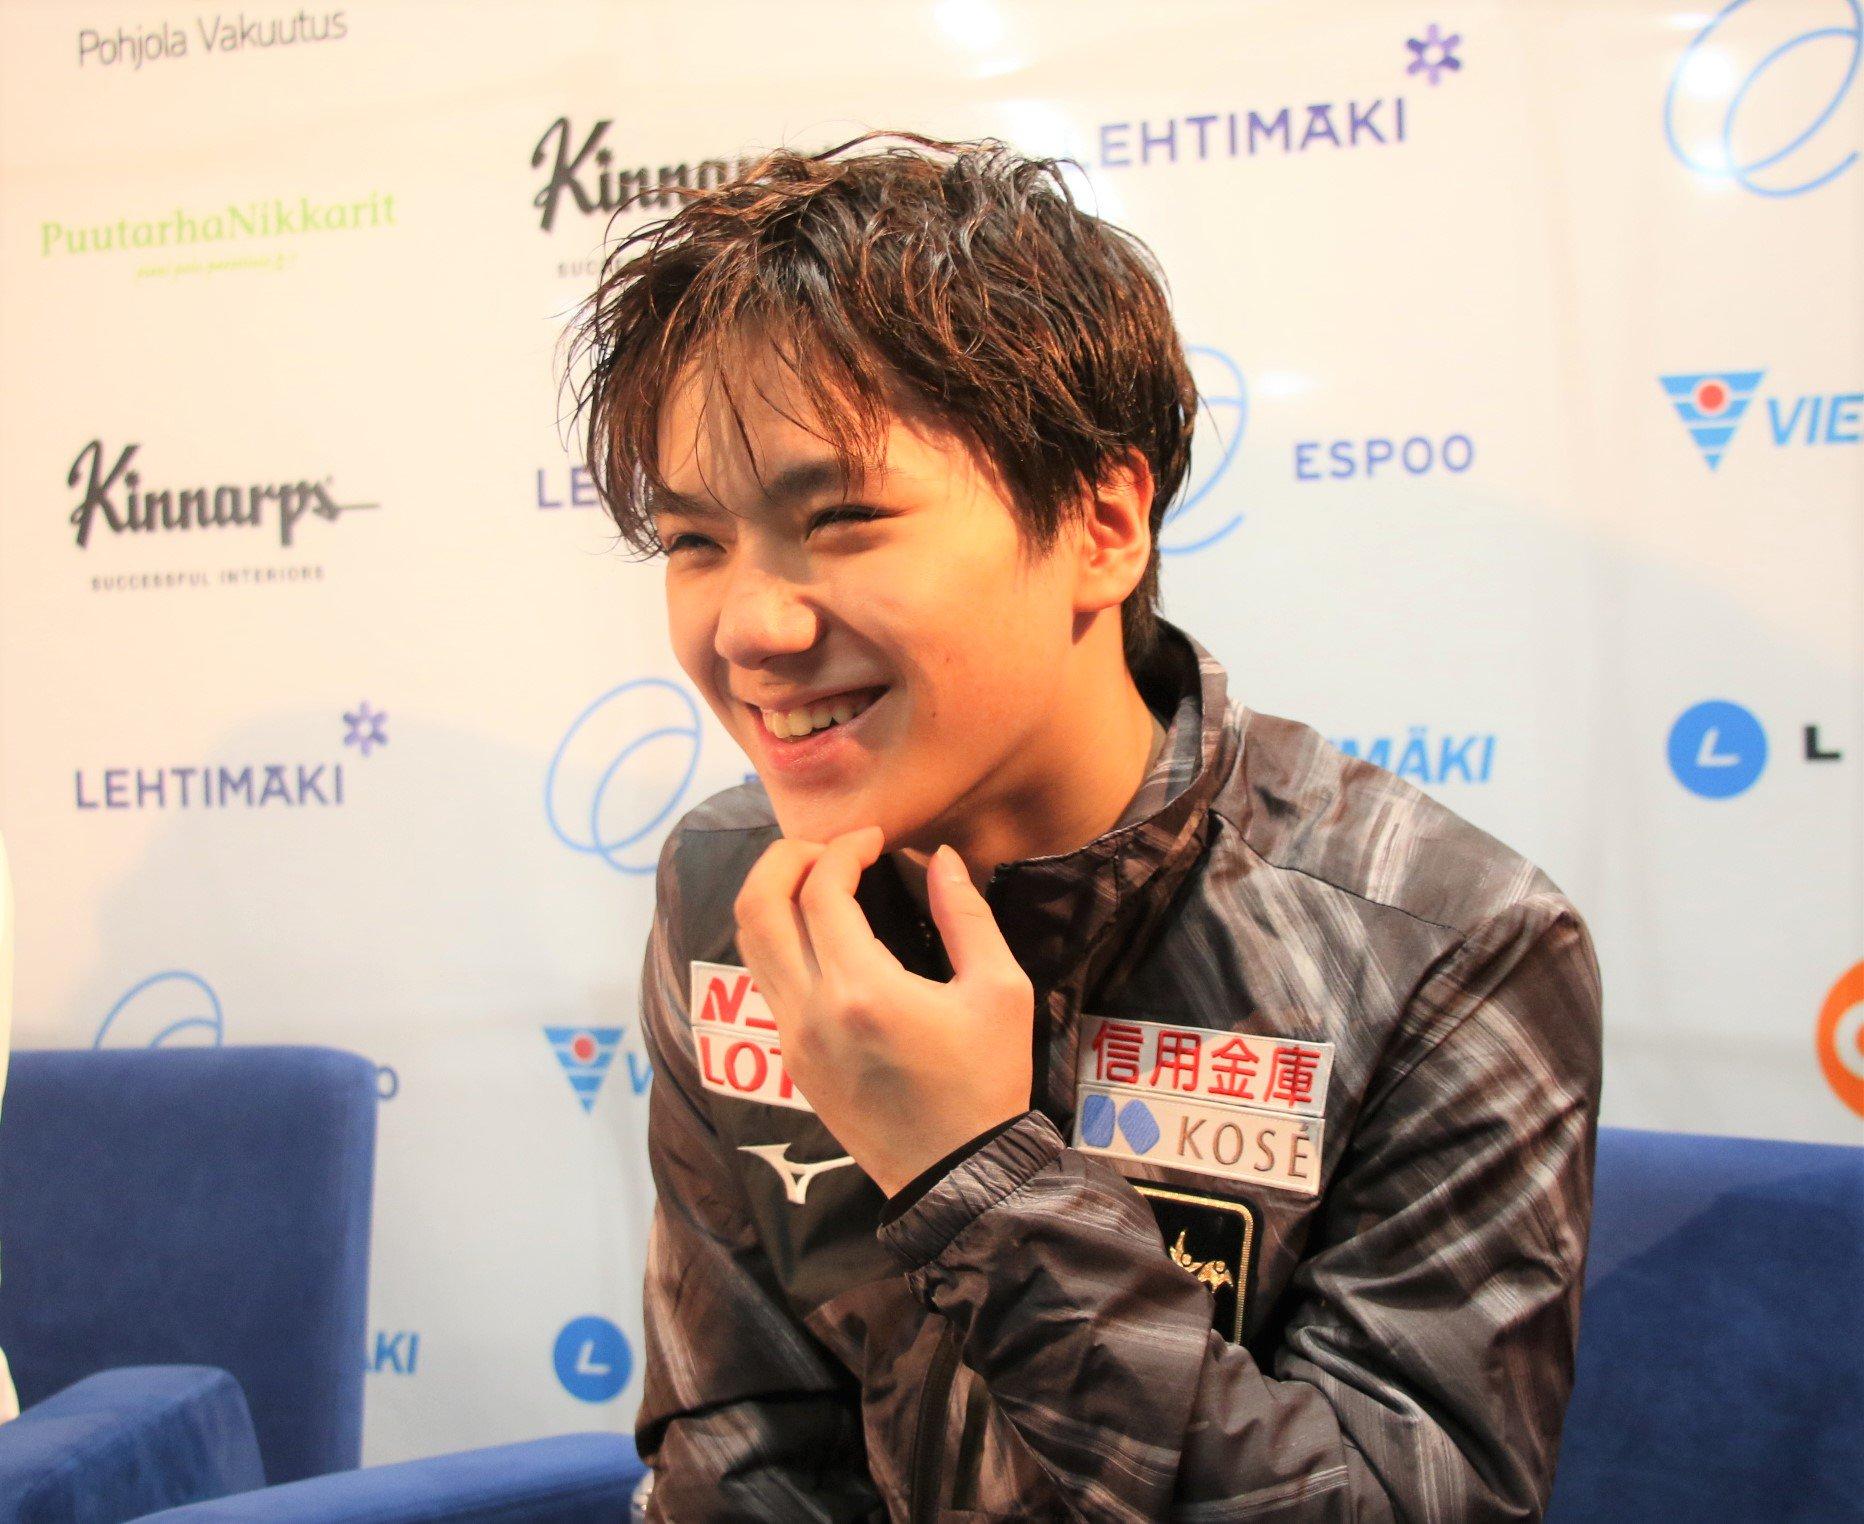 Challenger (6) - Finlandia Trophy. Oct 11 - 13, 2019. Espoo /FIN      - Страница 10 EGszZ8gWkAEAZx0?format=jpg&name=large